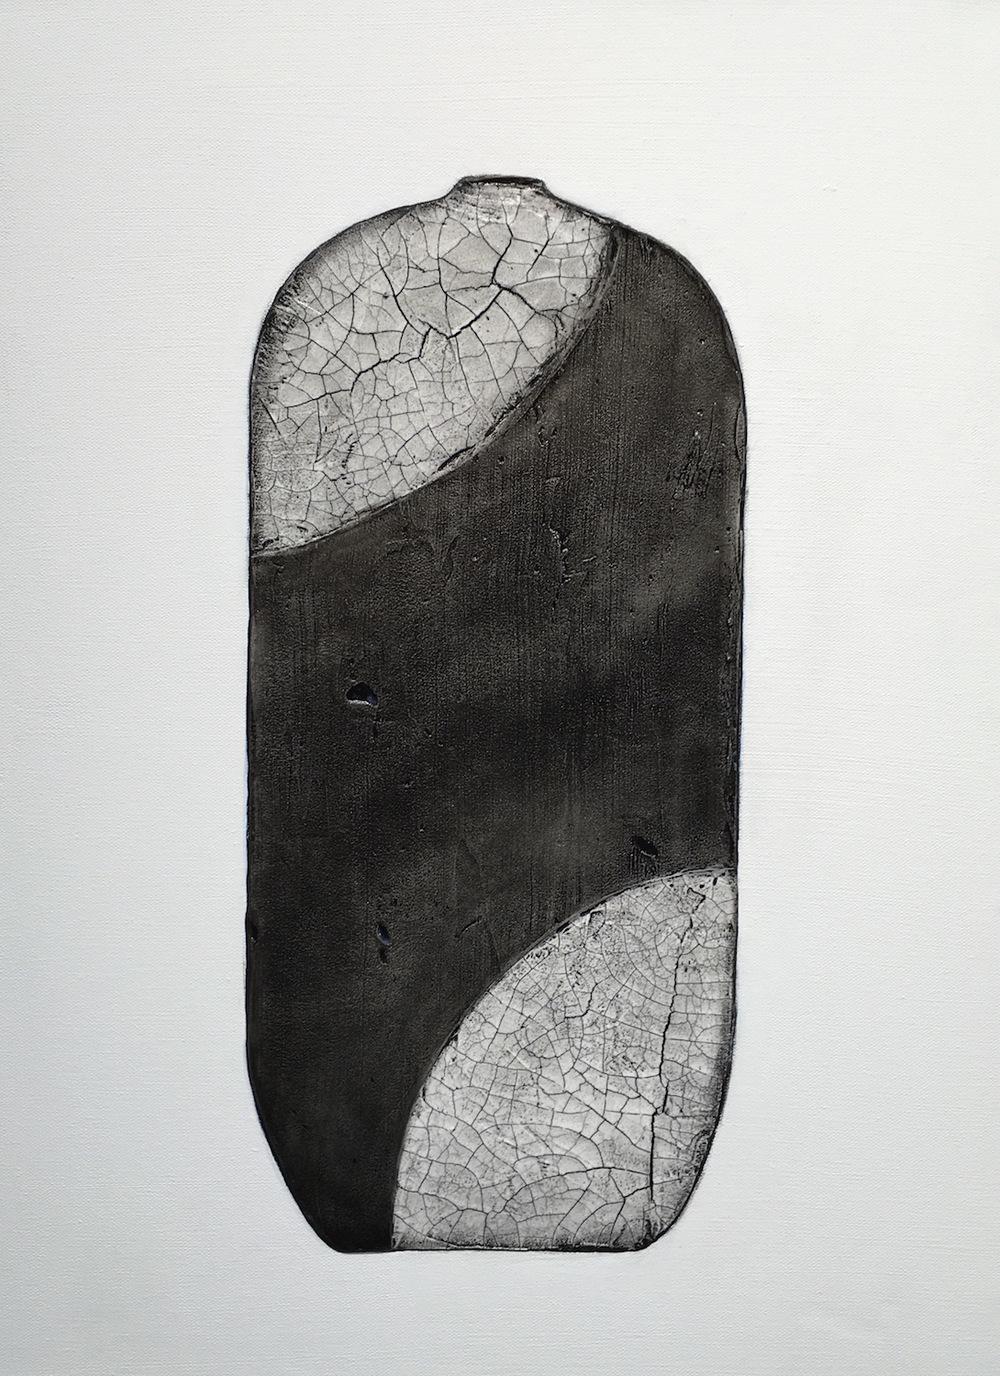 Raku Pottery Series IV Triptych-Terri Deskins